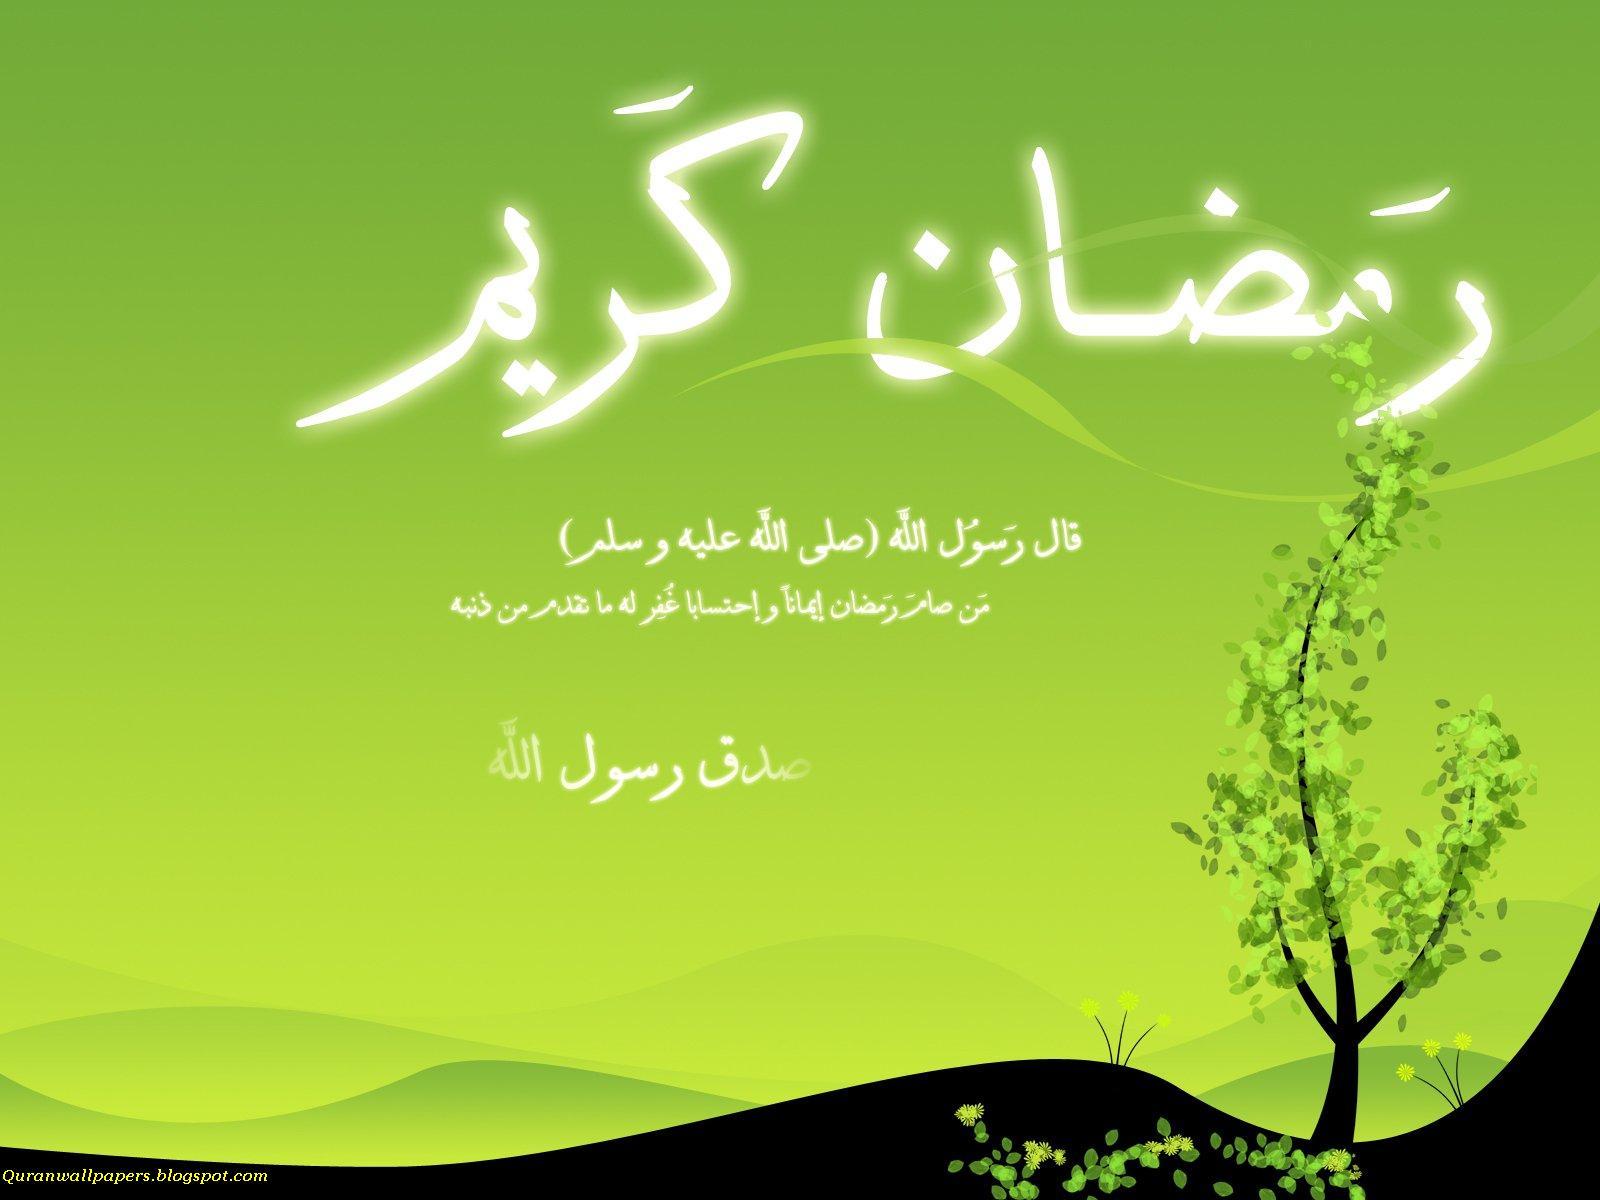 http://4.bp.blogspot.com/_iCheHK2AFl0/TT9RB4PwtkI/AAAAAAAAAD4/wvWUb22cV6U/s1600/Ramadan-wallpaper_green_1600x1200.jpg